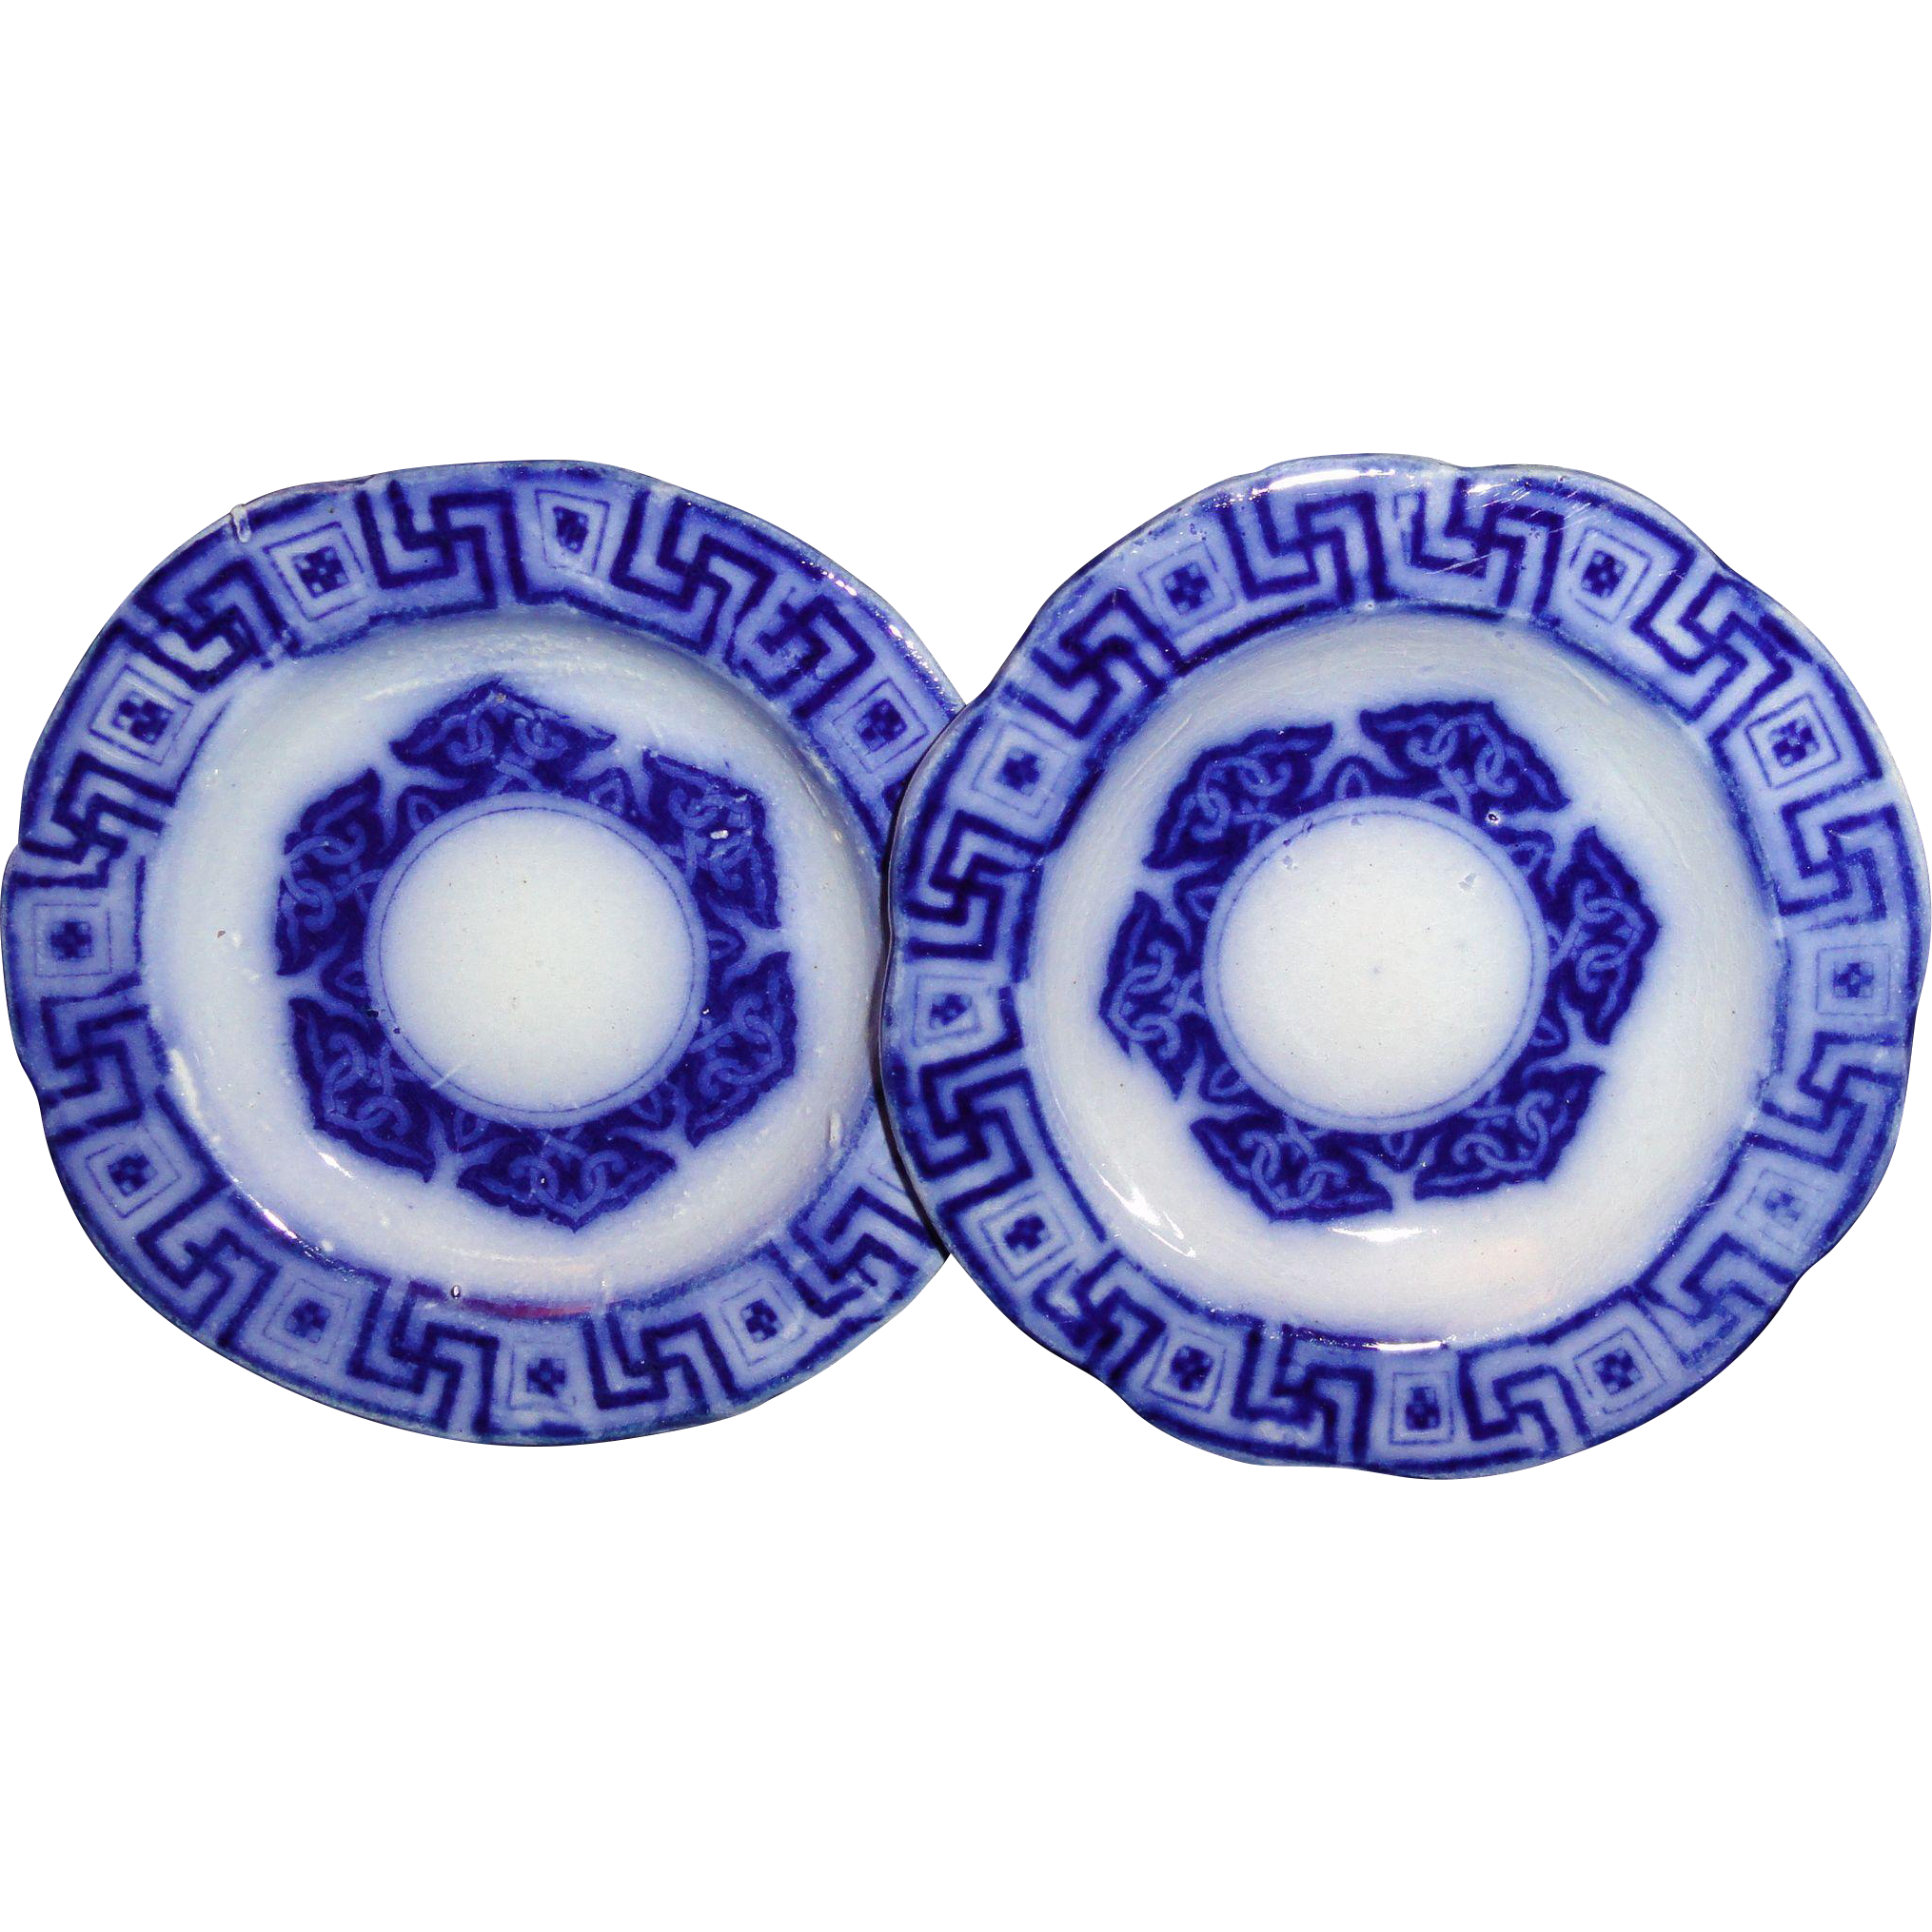 Pair of Flow Blue Toy Plates 3.5 inch Greek Key Kaleidoscope 1820 Staffordshire